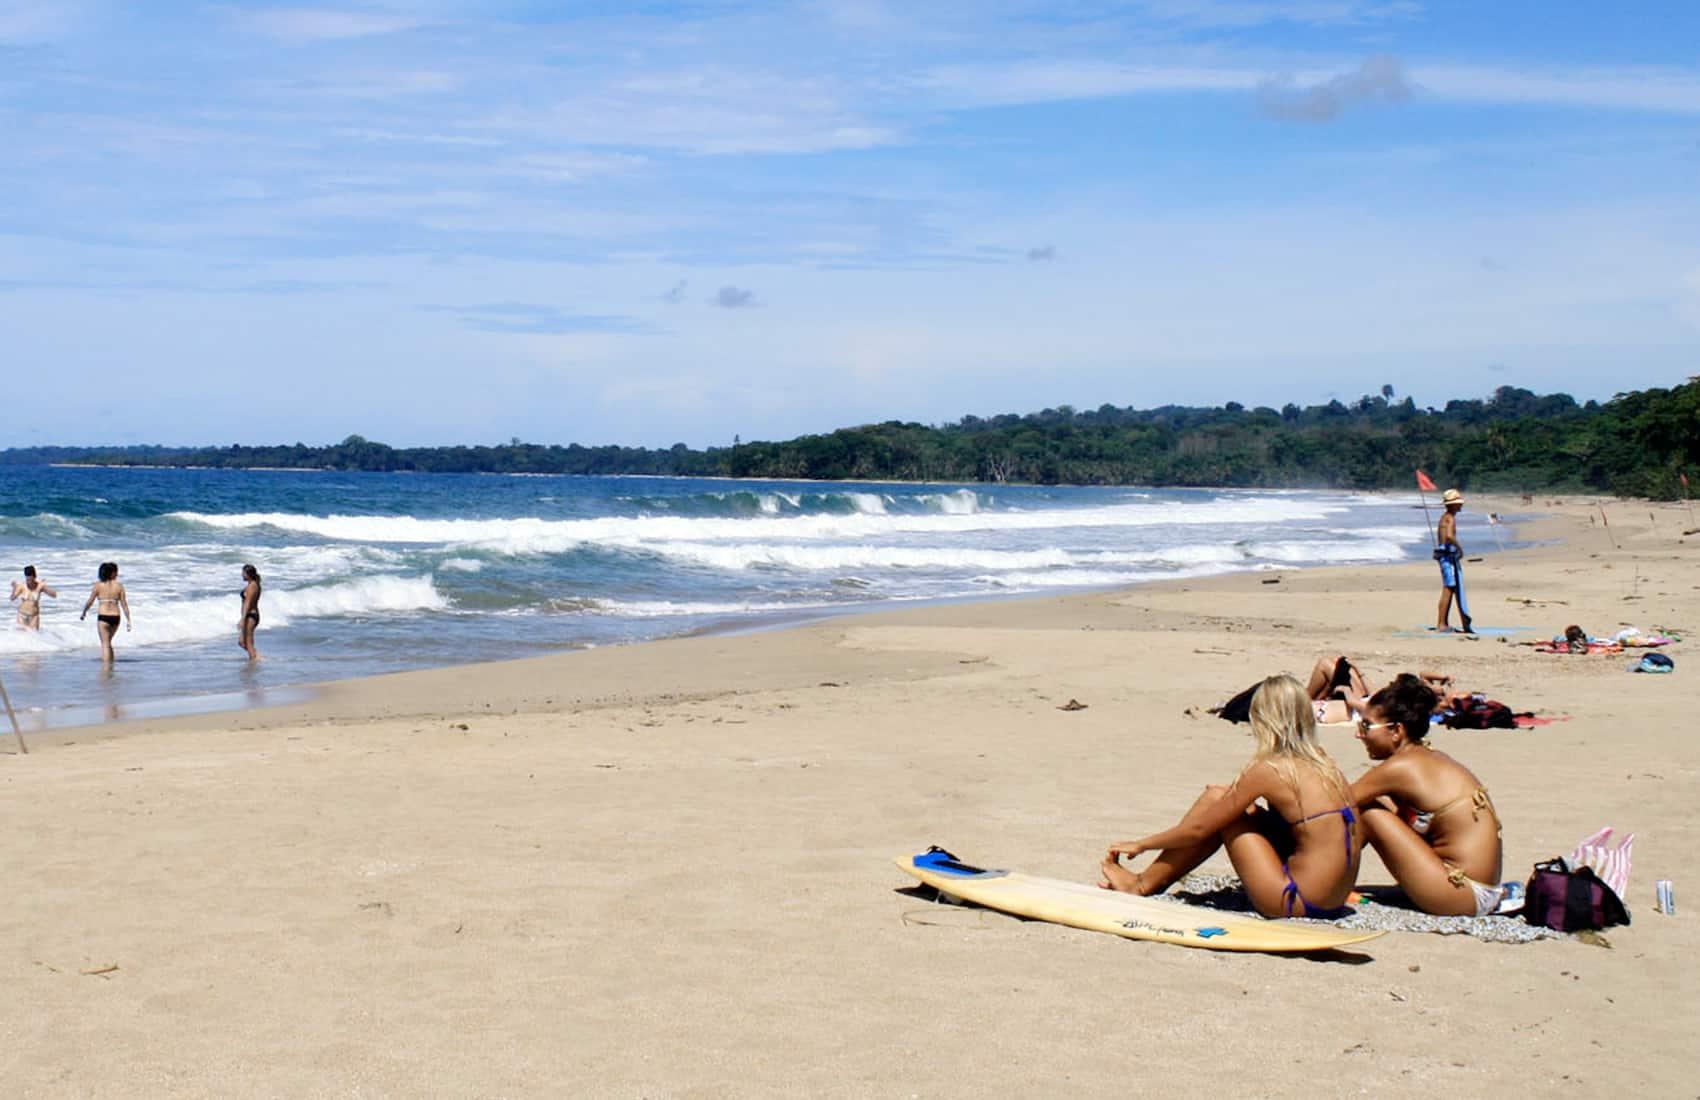 Dry season in Costa Rica